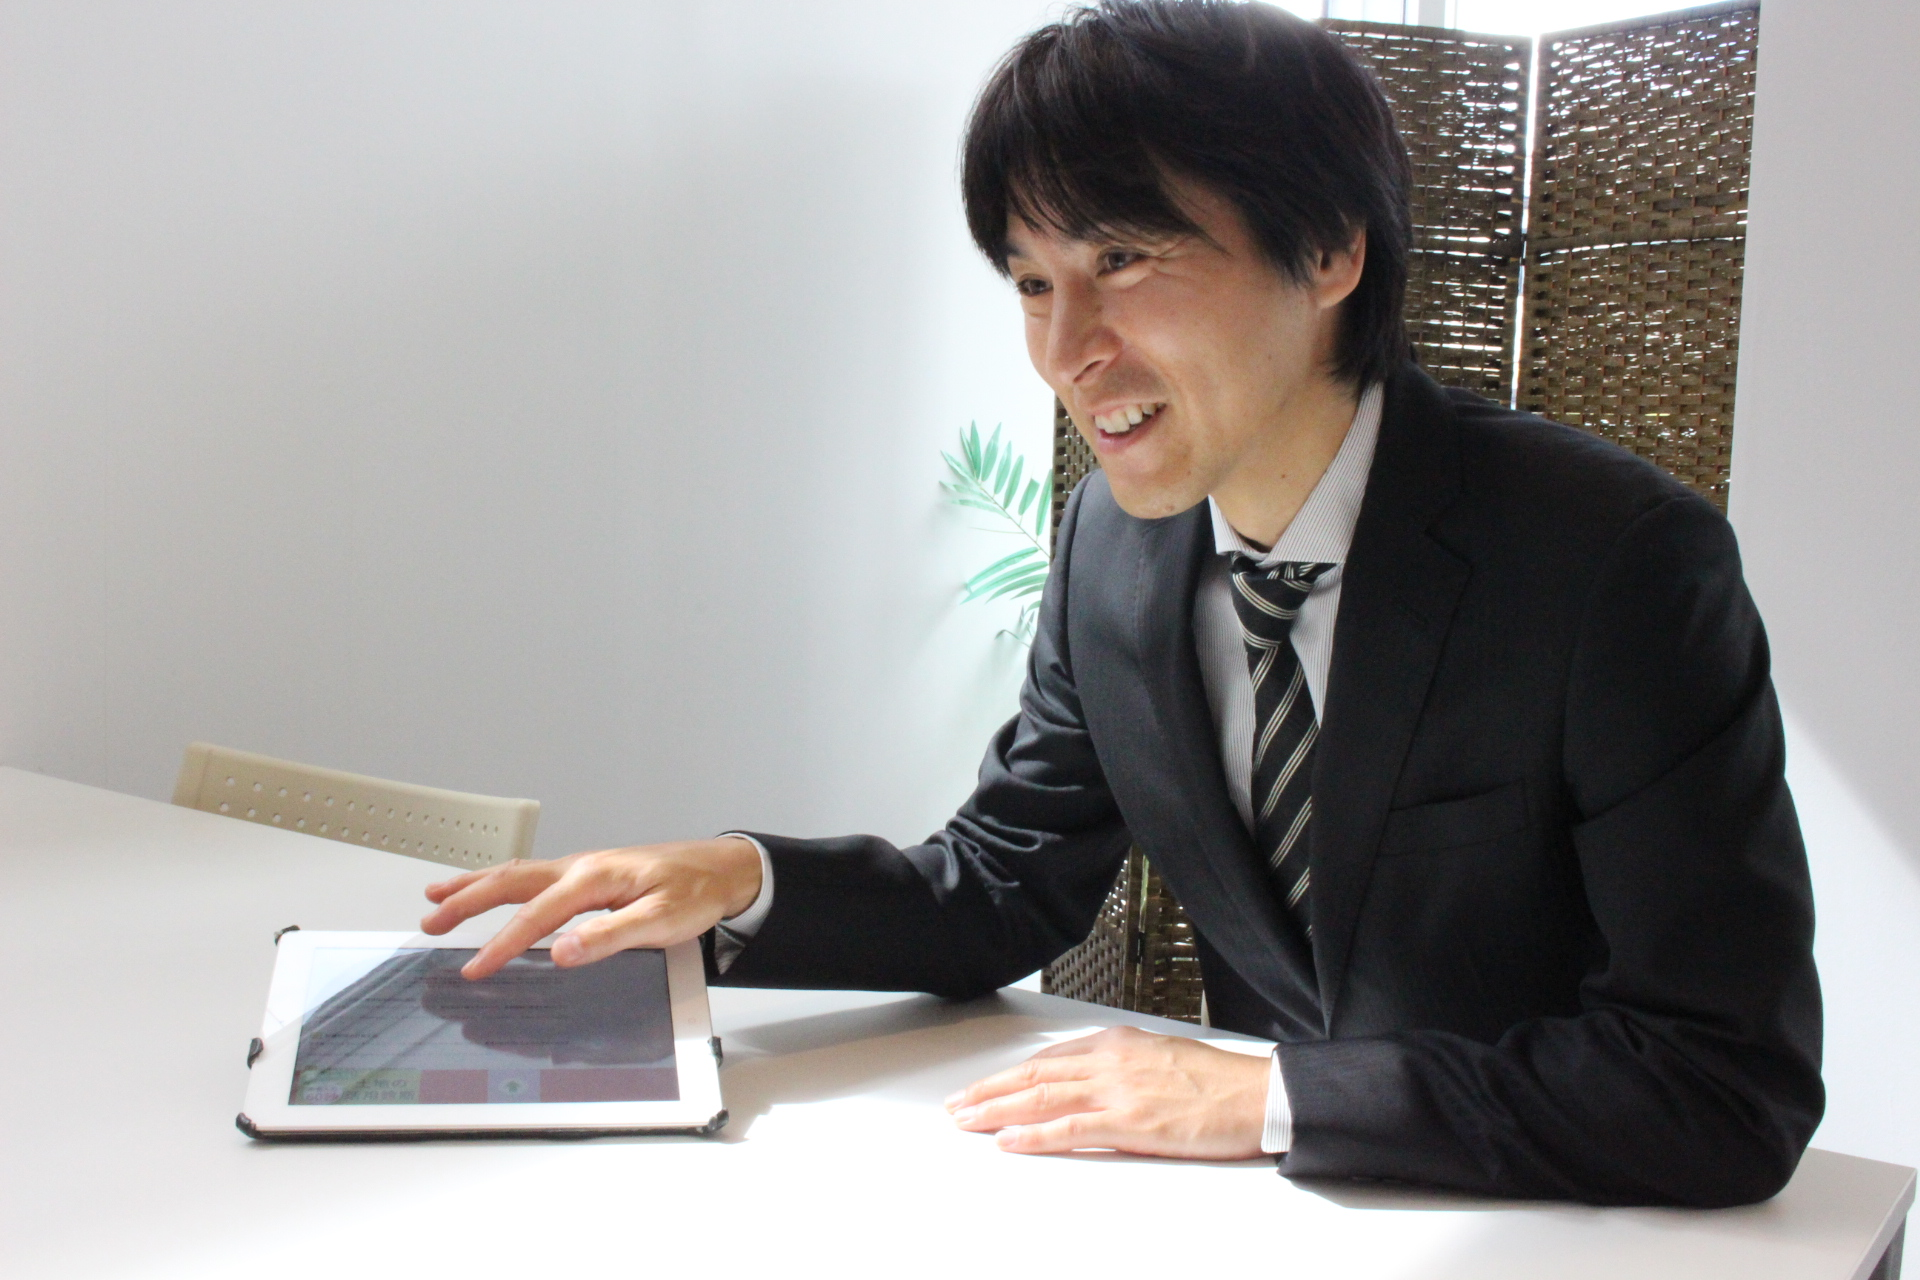 https://www.u-space.co.jp/career/wp-content/uploads/2019/09/IMG_5179.jpg